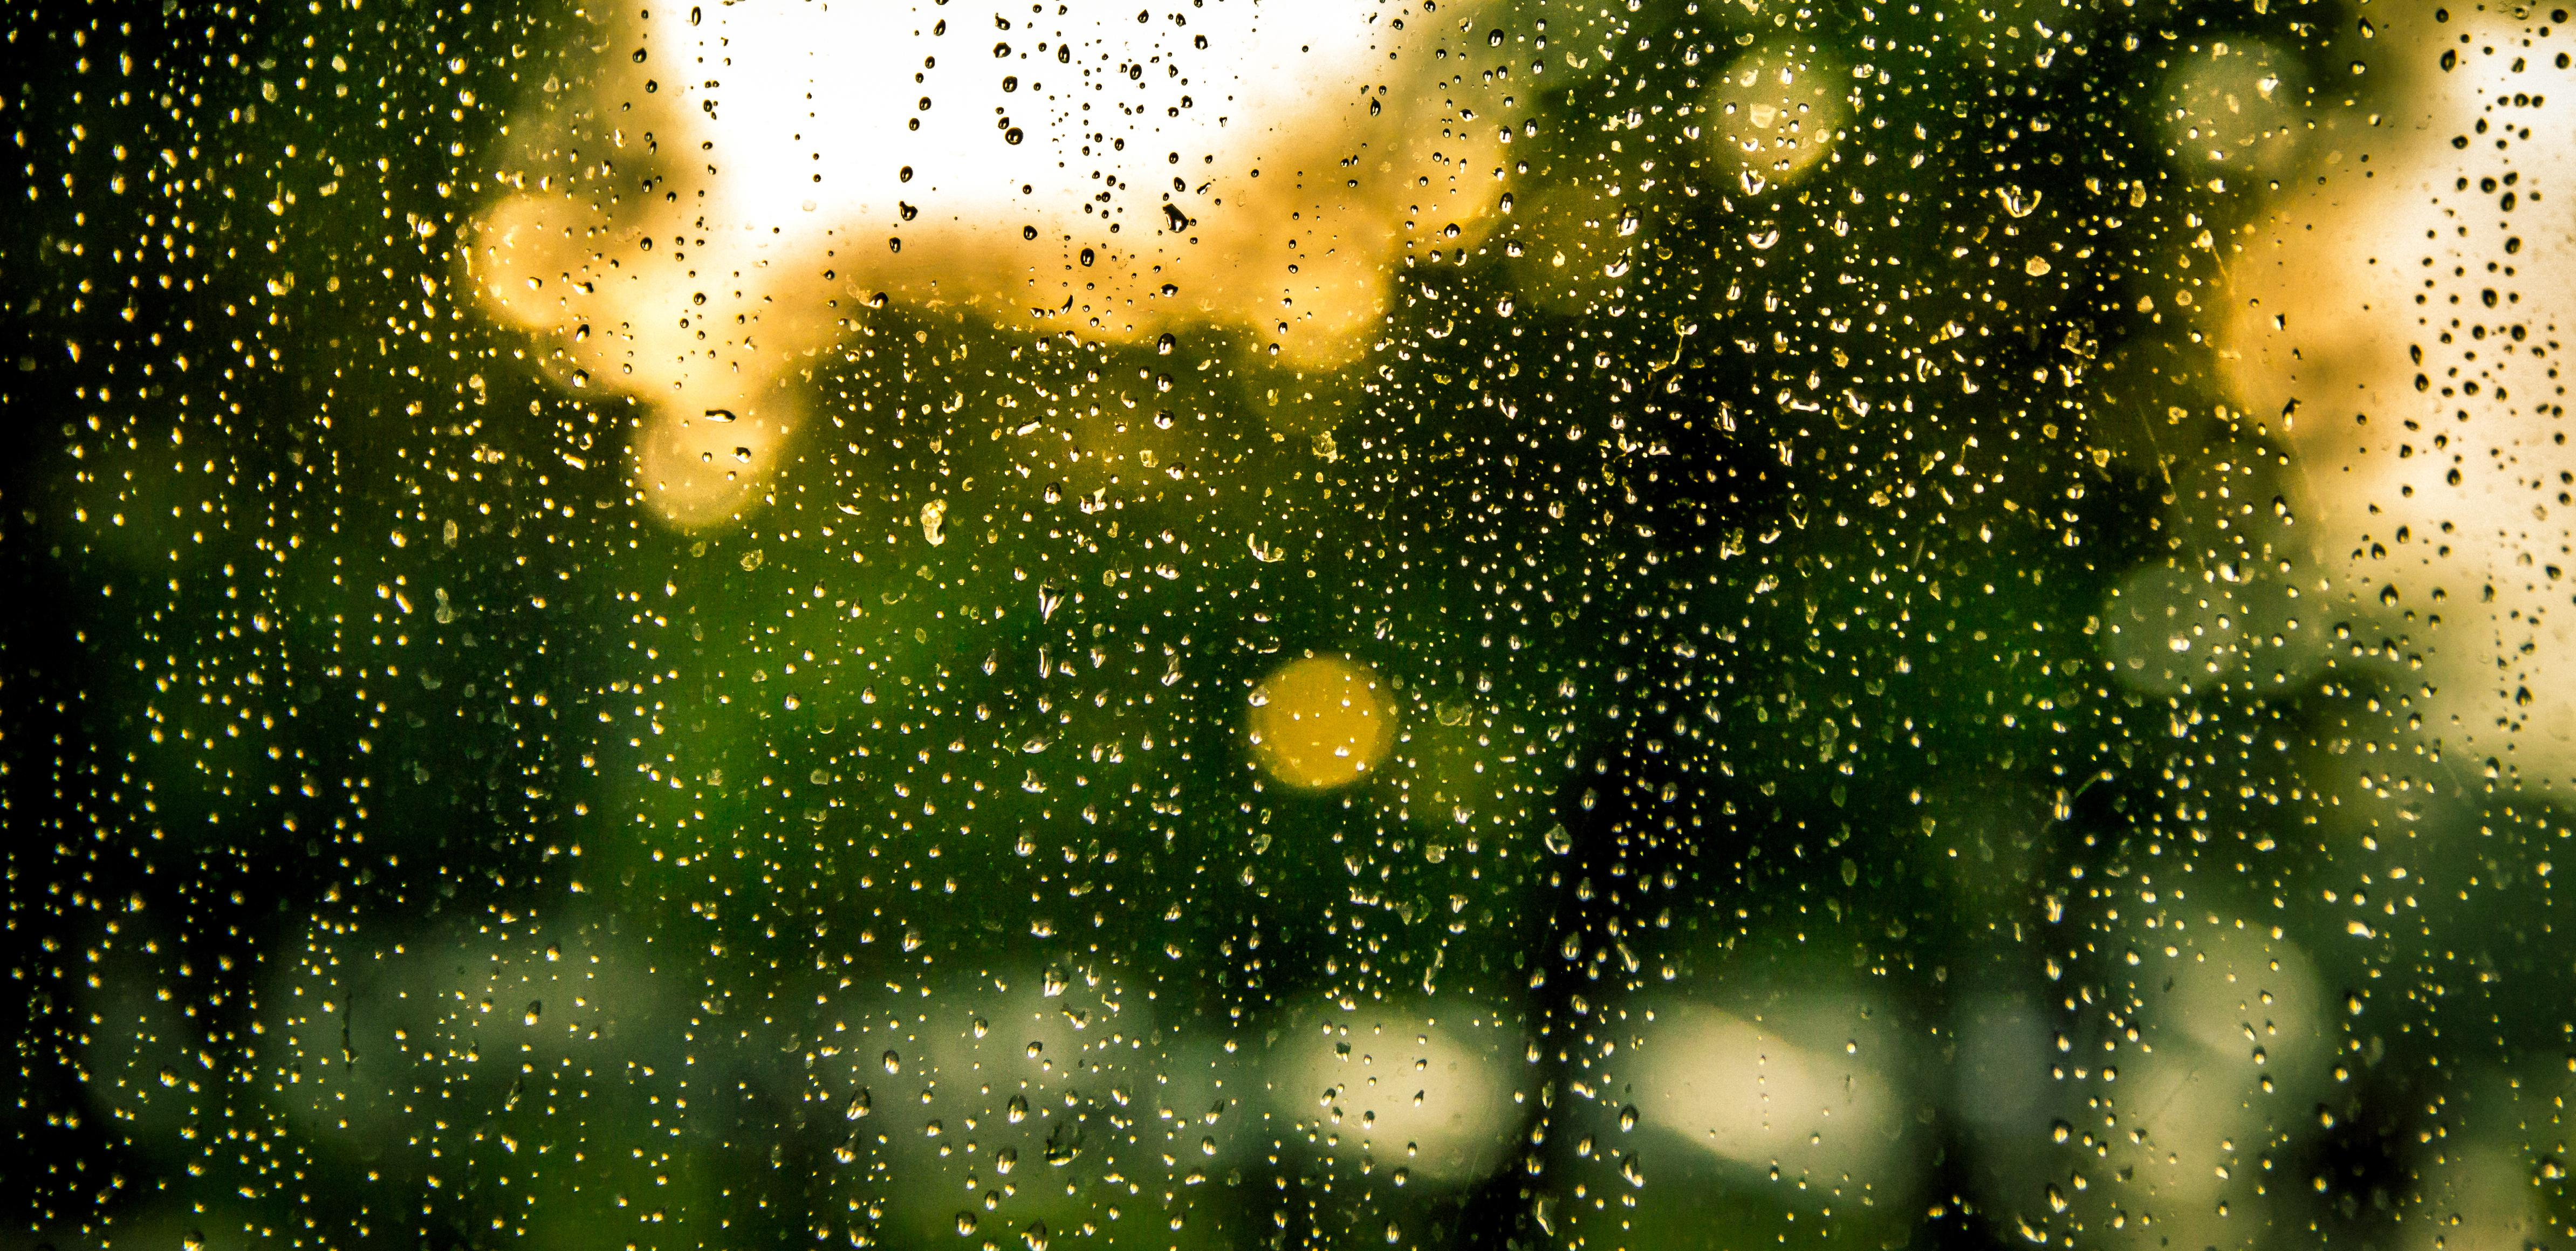 rain переводrain drop drop top, rain перевод, rain rain go away, rain man, rain cs go, rain over me, rain soul, rain 104, rain international, rain world, rain death, rain steam, rain drop, rain песня, rain core, ryanair, rain sound, rain bird, rain bi, rain check